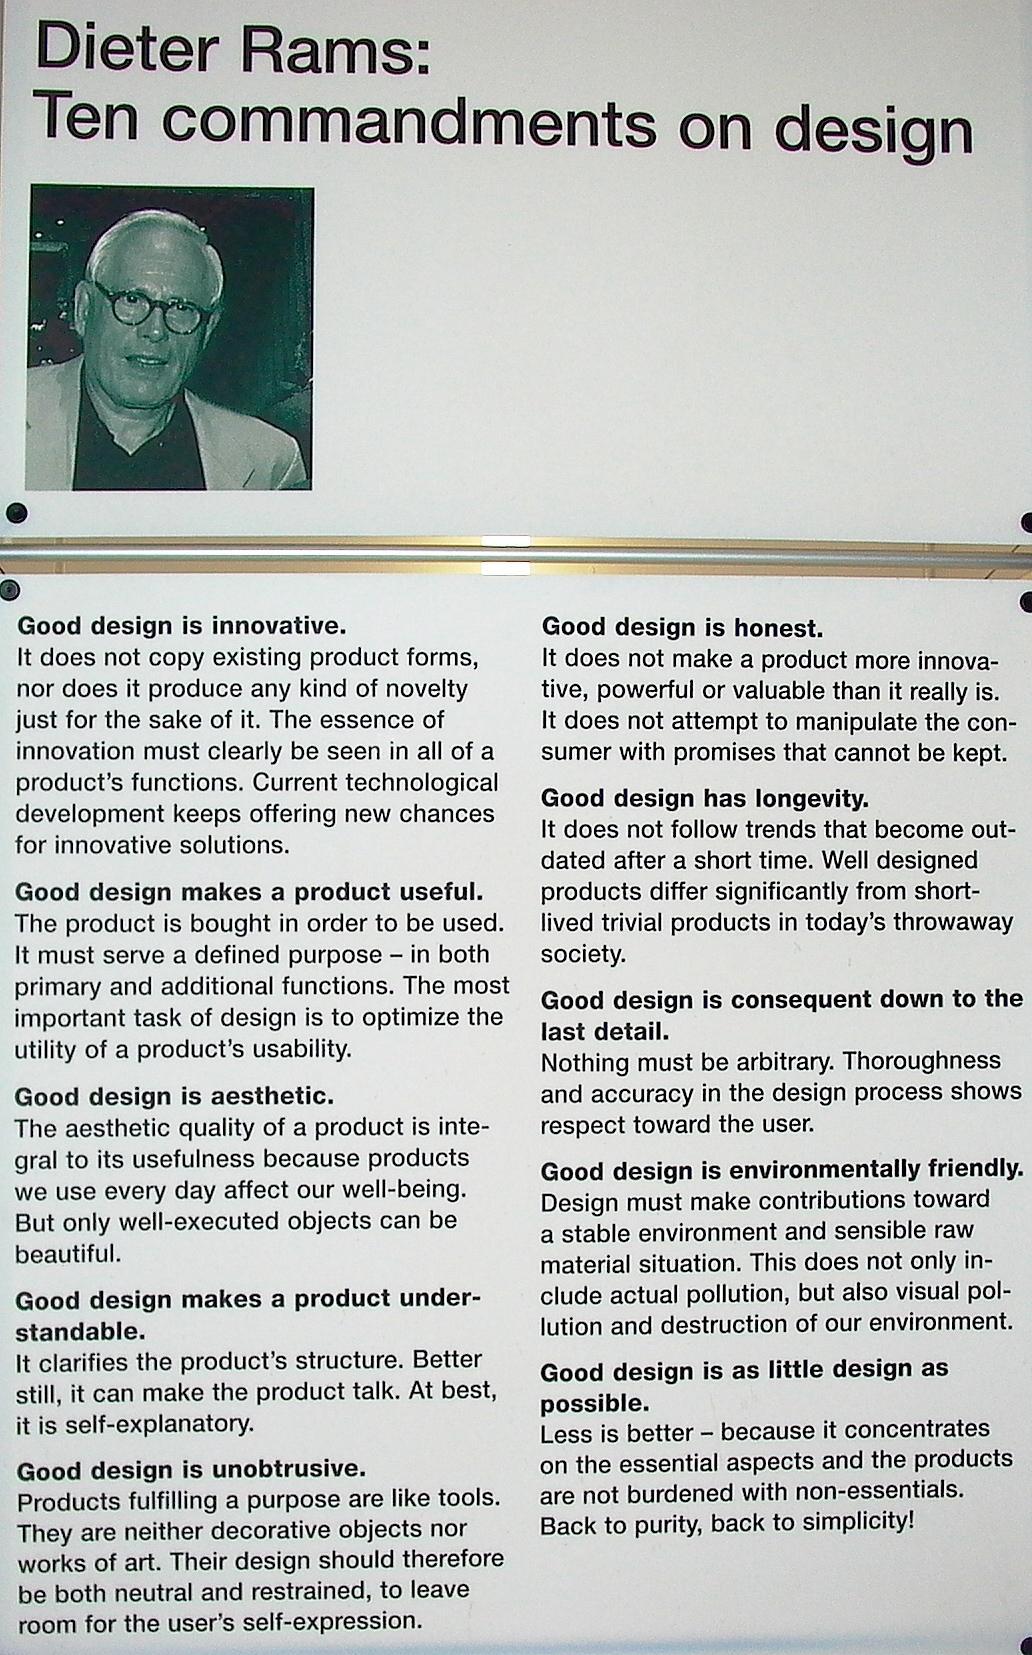 Dieter_Rams_Design_Principles.jpg (1032×1655)